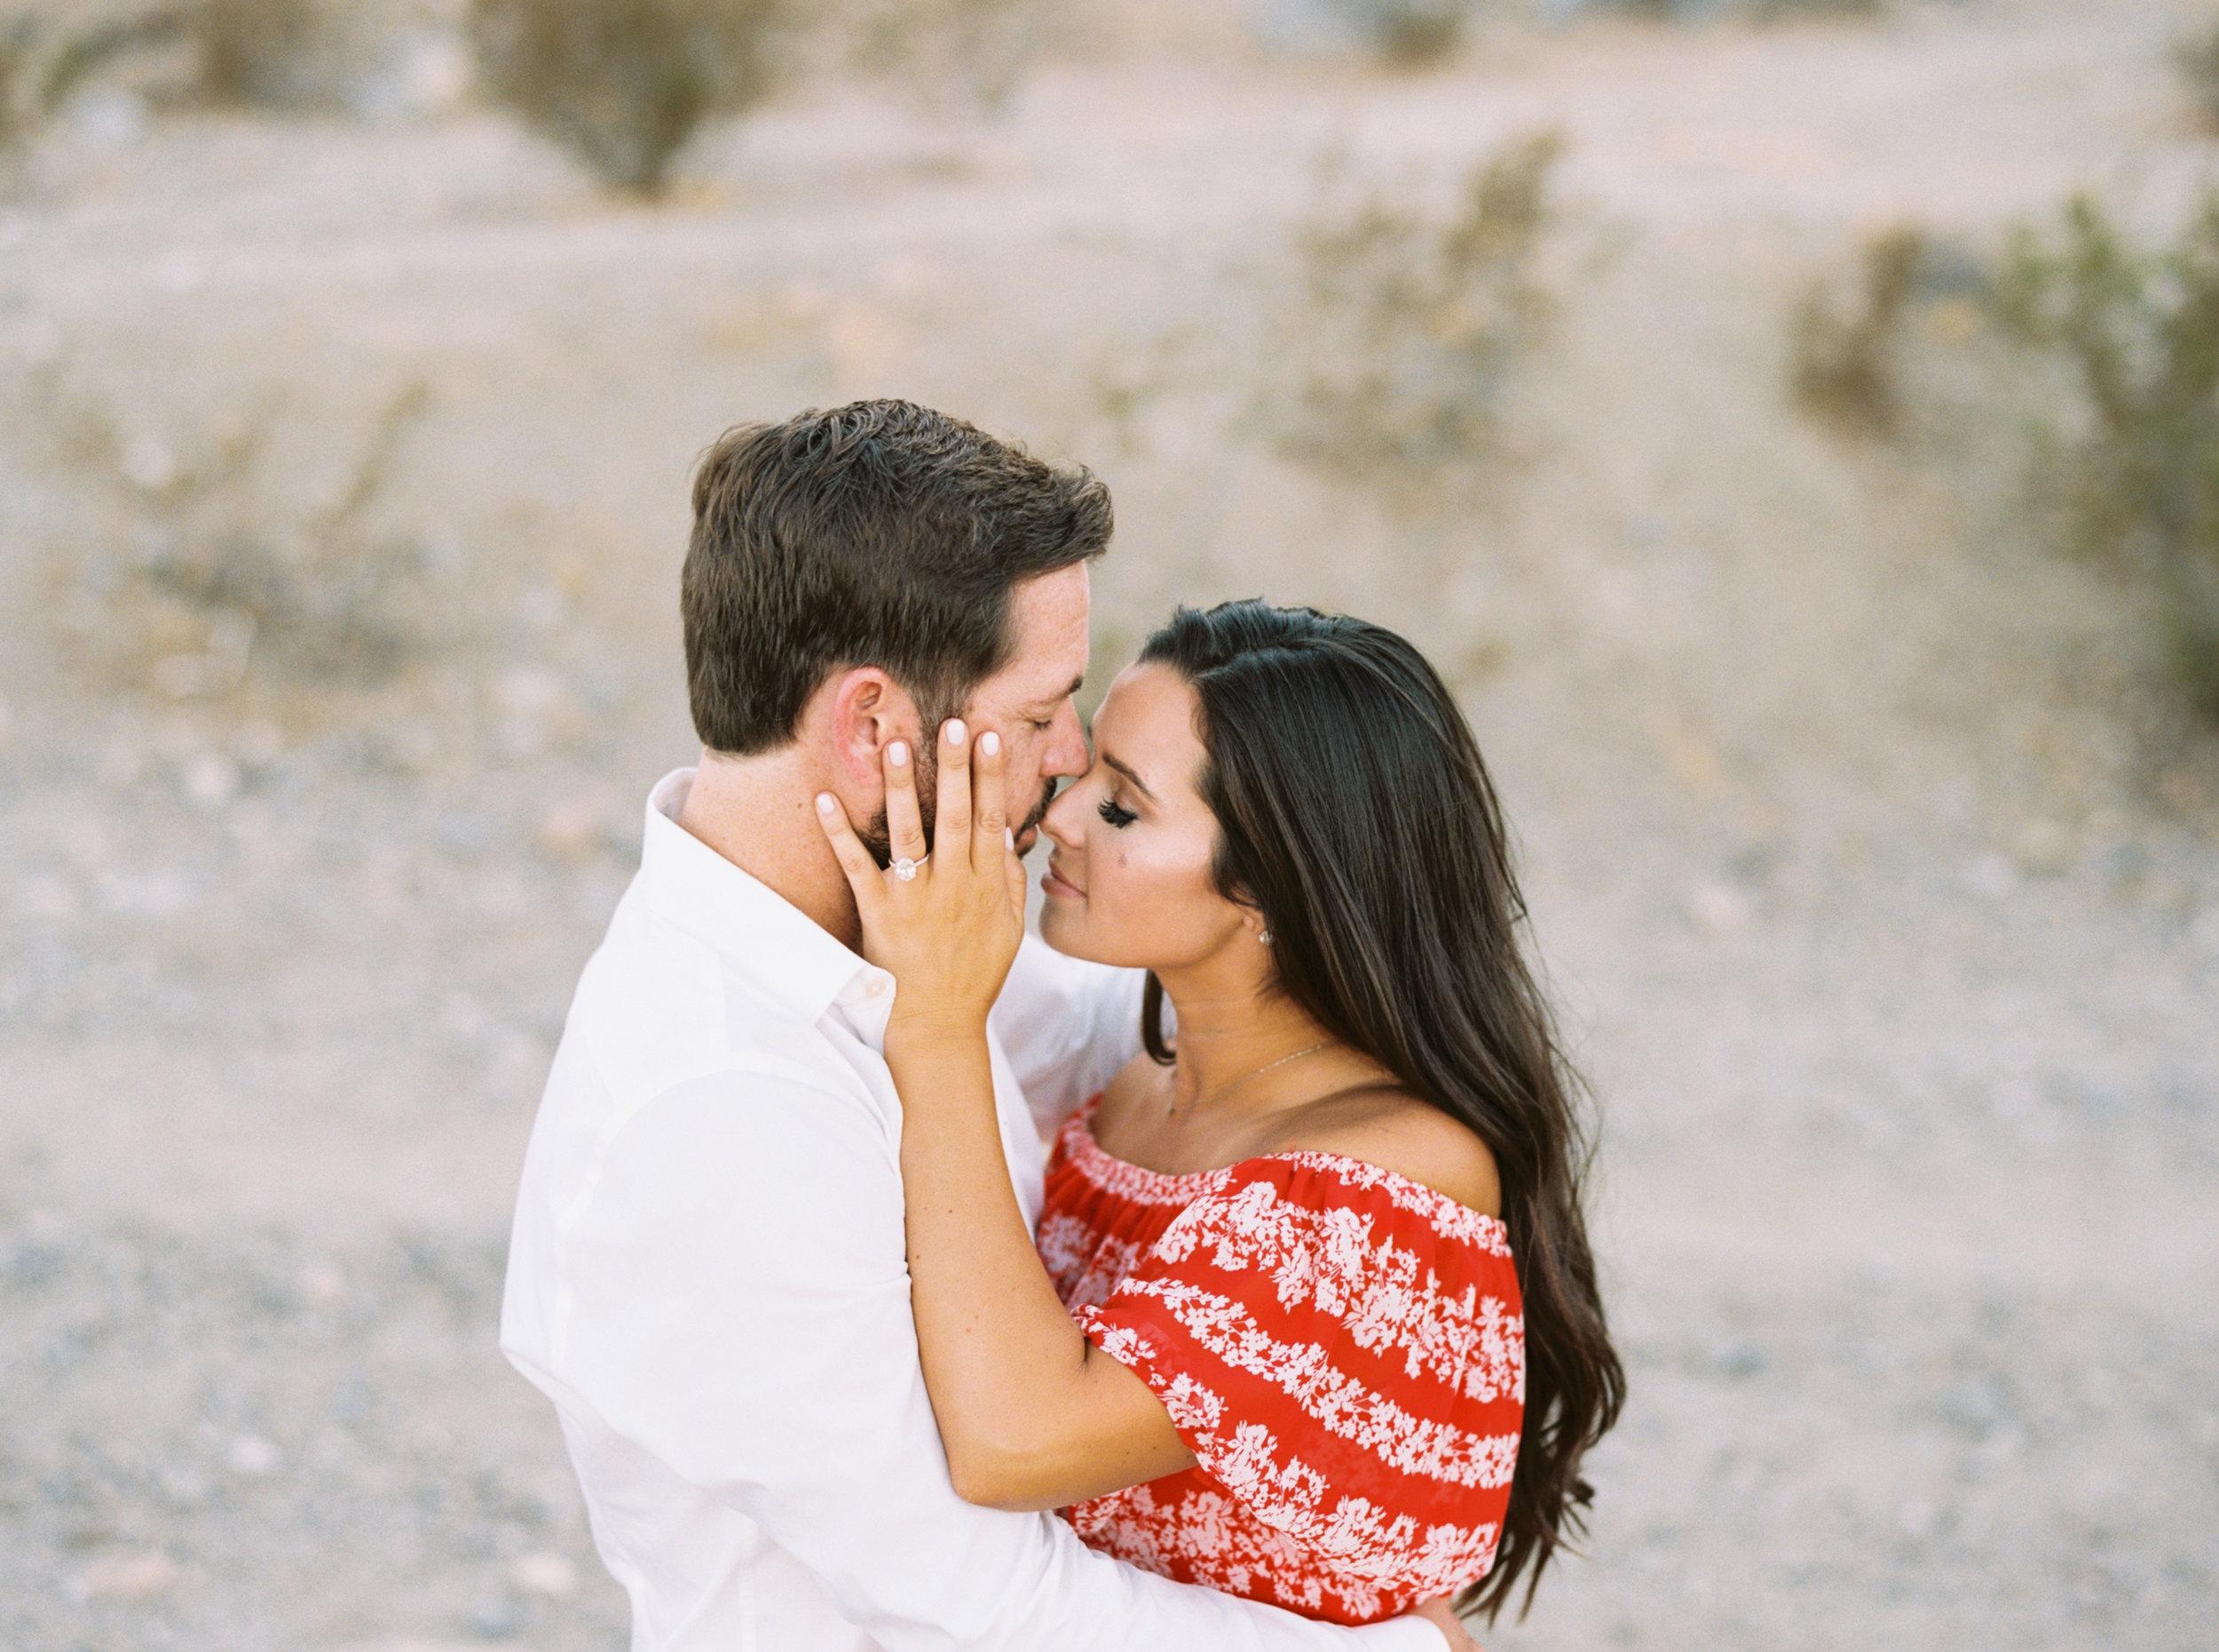 Palm Sprinsg Wedding Photographer Jenny Losee (24 of 32).jpg